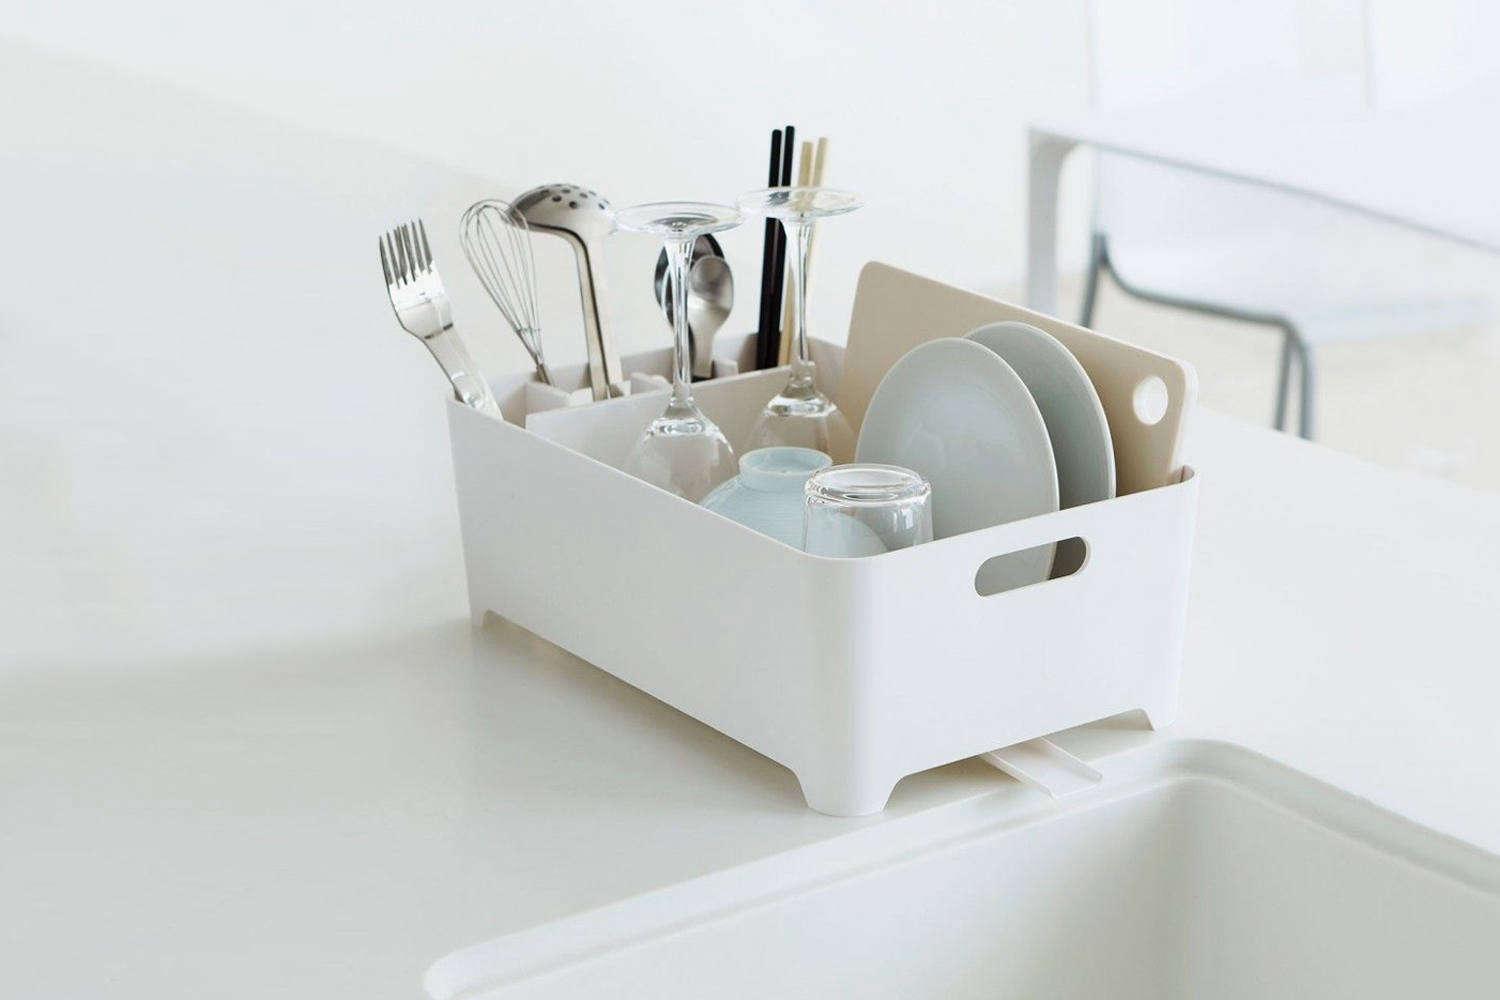 MUJI Kitchen Tool Dish Drainer Stainless basket slide type from Japan